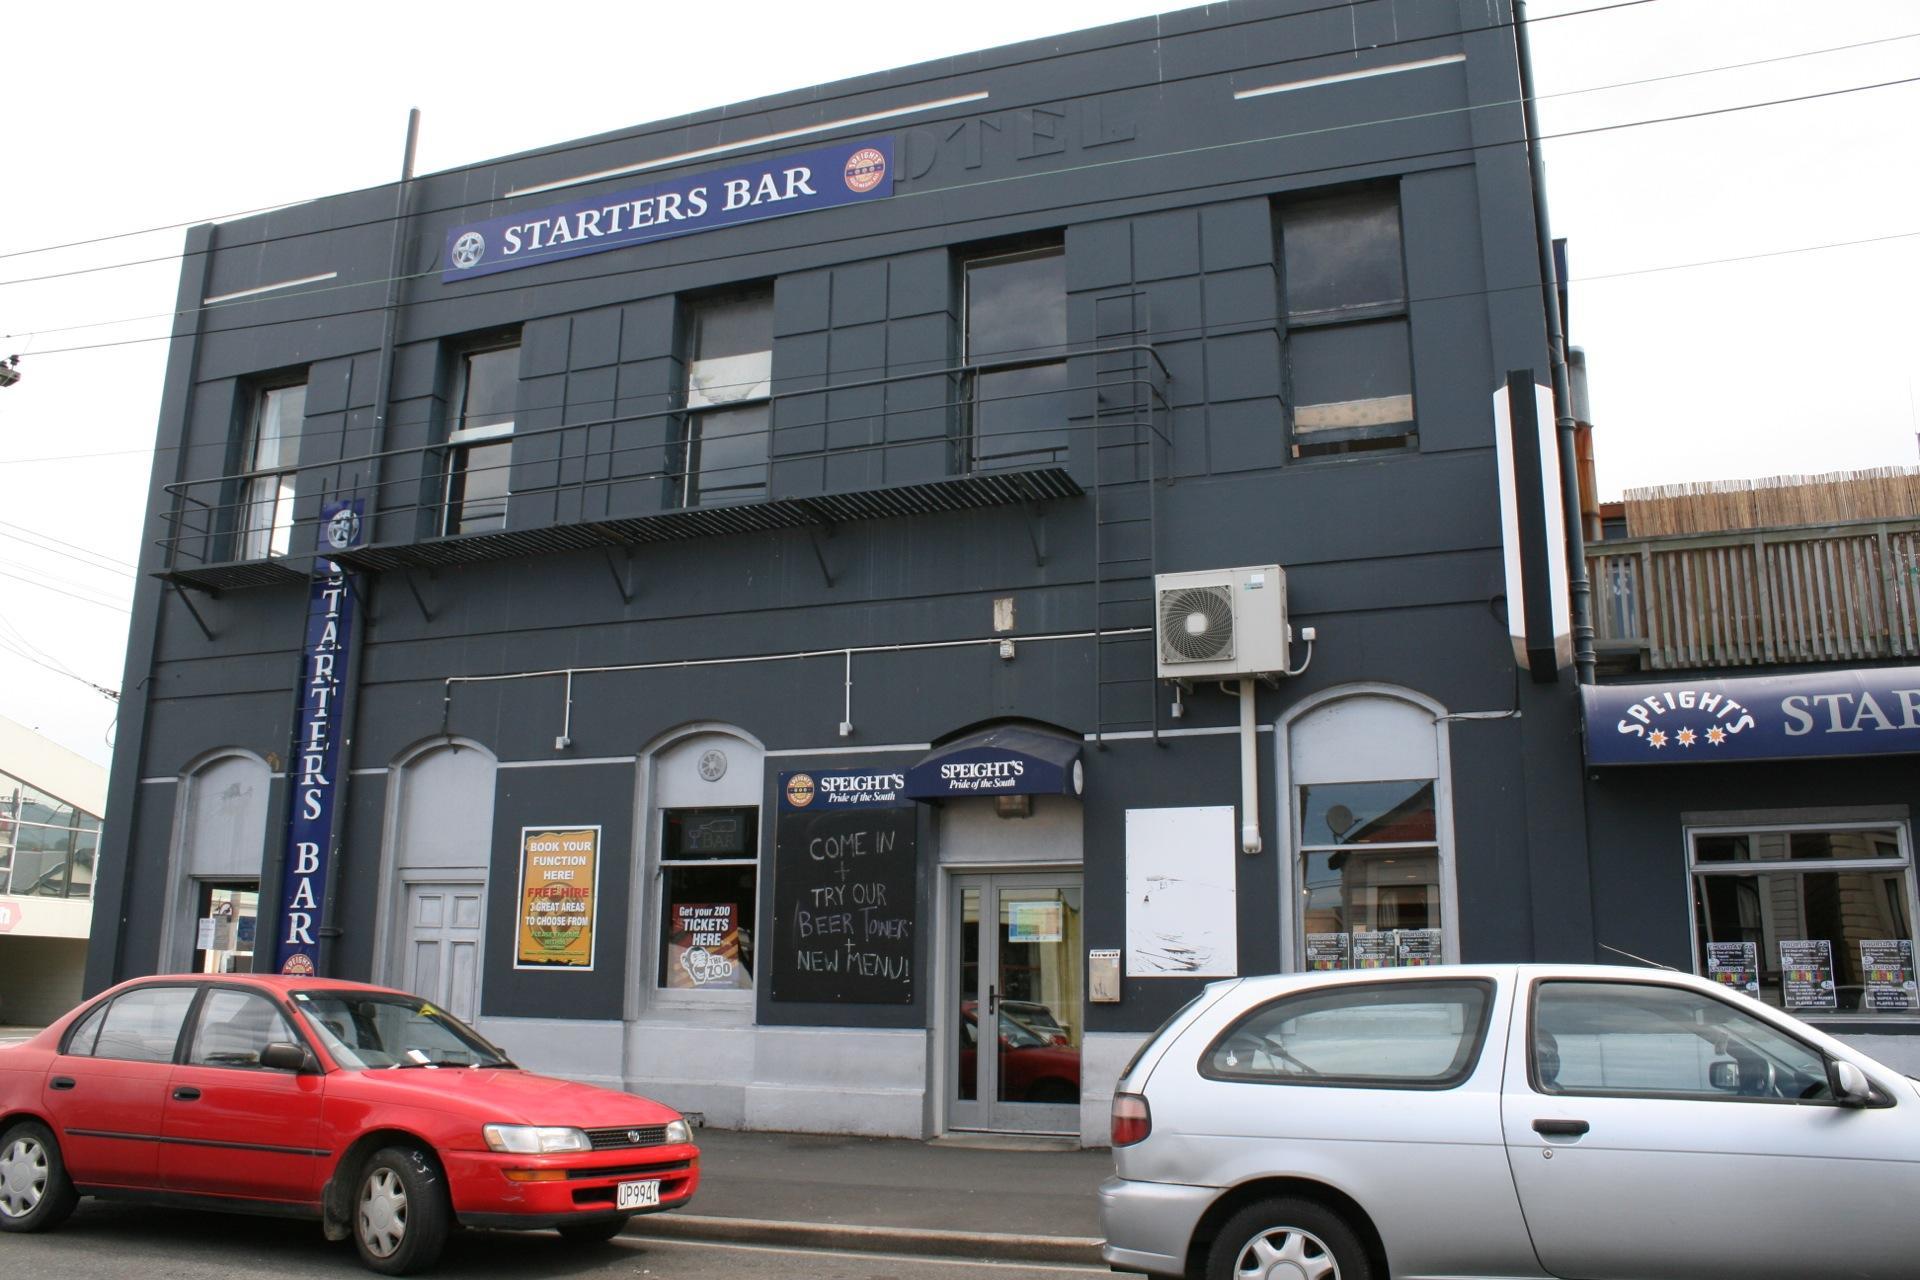 Starters Bar